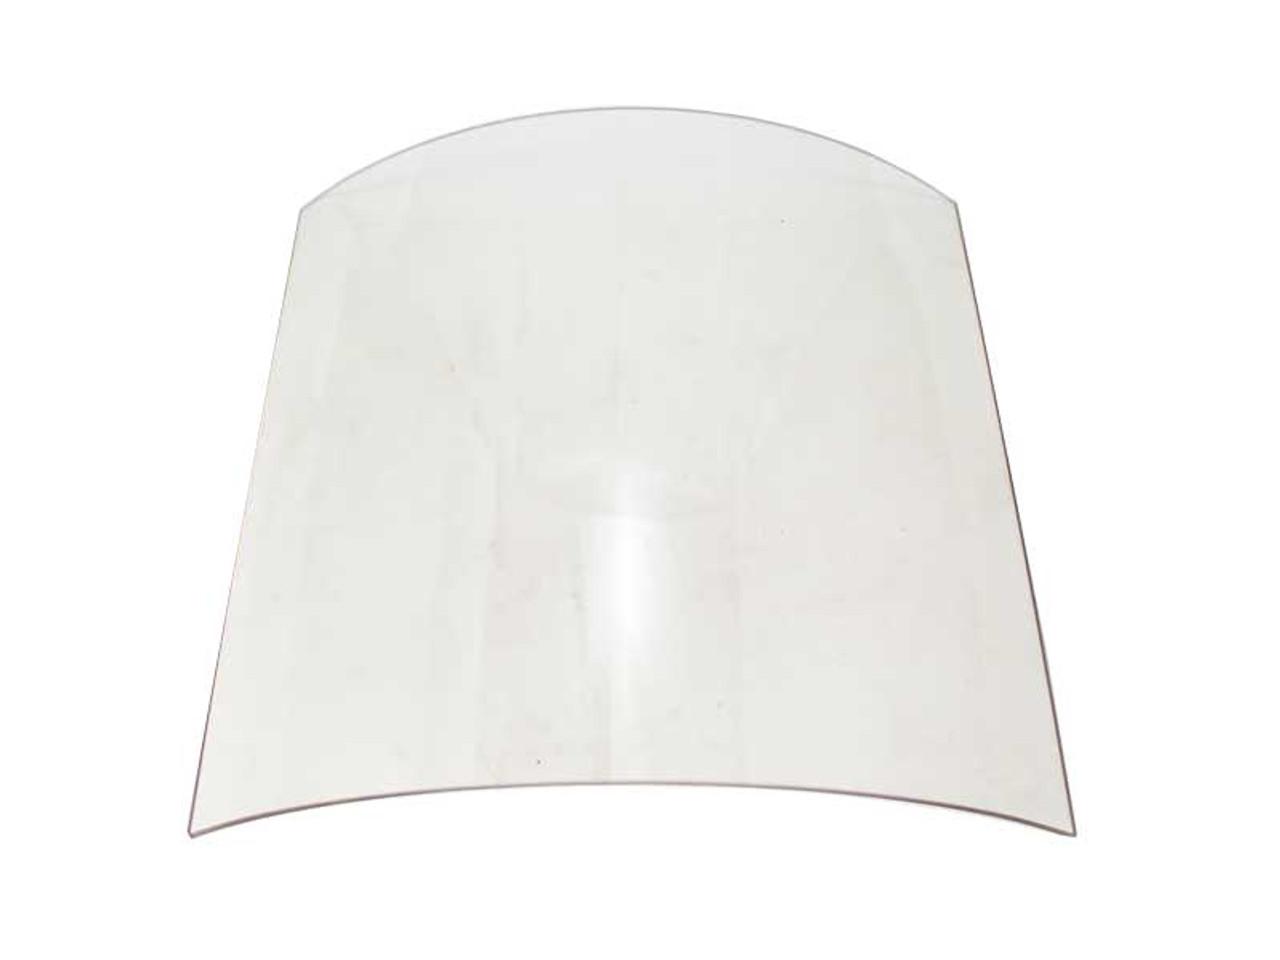 Austroflamm Espirit Curved Front Glass (Z18202)